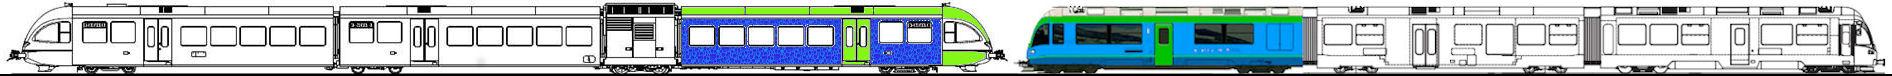 ferrovia delle dolomiti dolomitenbahn ferata dles dolomites